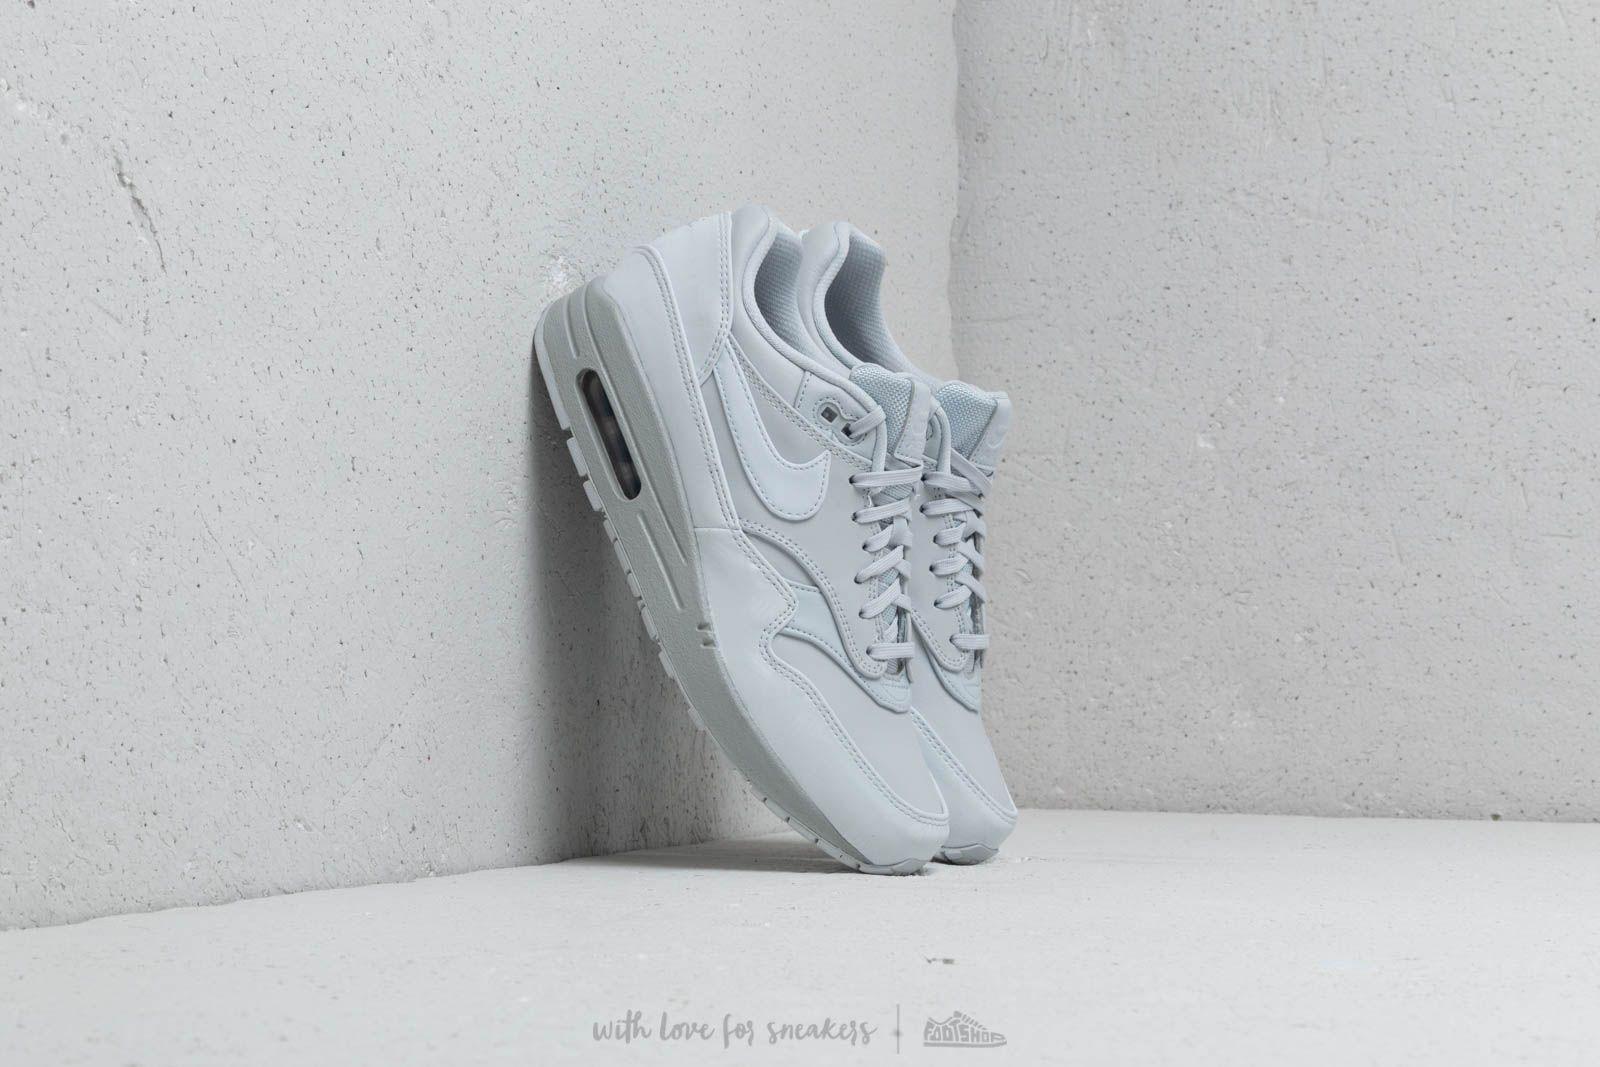 hot sale online d3e18 d45d8 Nike Wmns Air Max 1 LX Pure Platinum Pure Platinum at a great price £